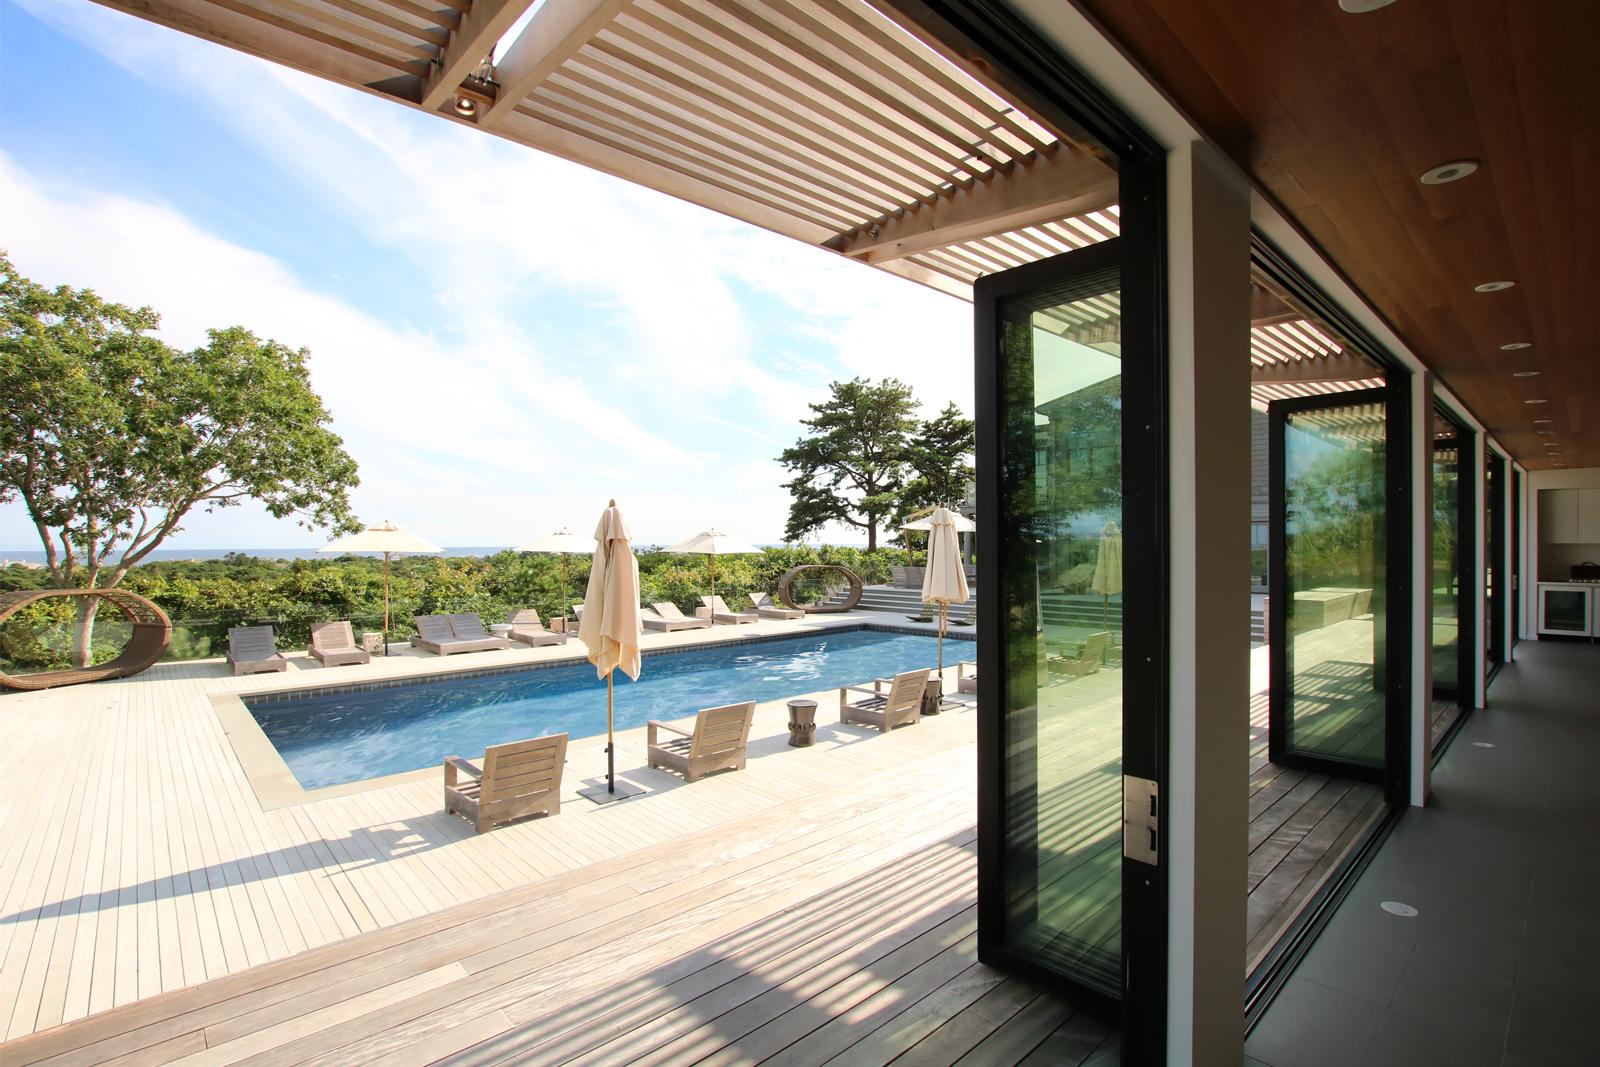 res4-resolution-4-architecture-modern-modular-house-prefab-amagansett-addition-exterior-pool-deck-terrace.jpg